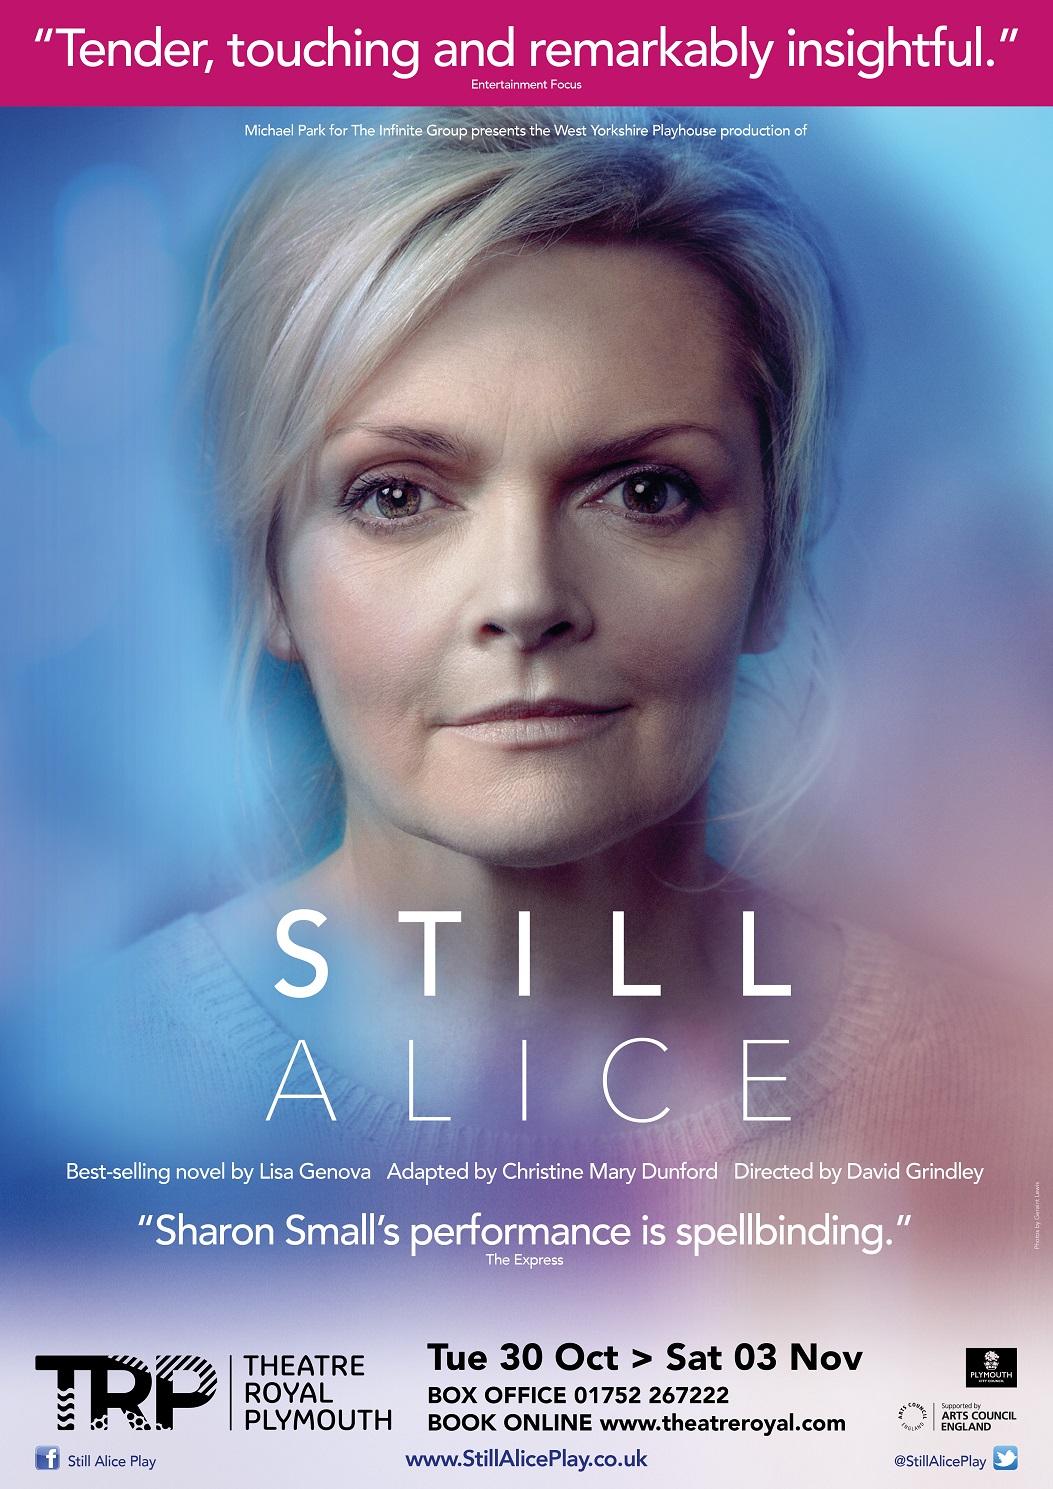 Still Alice Poster Show Image